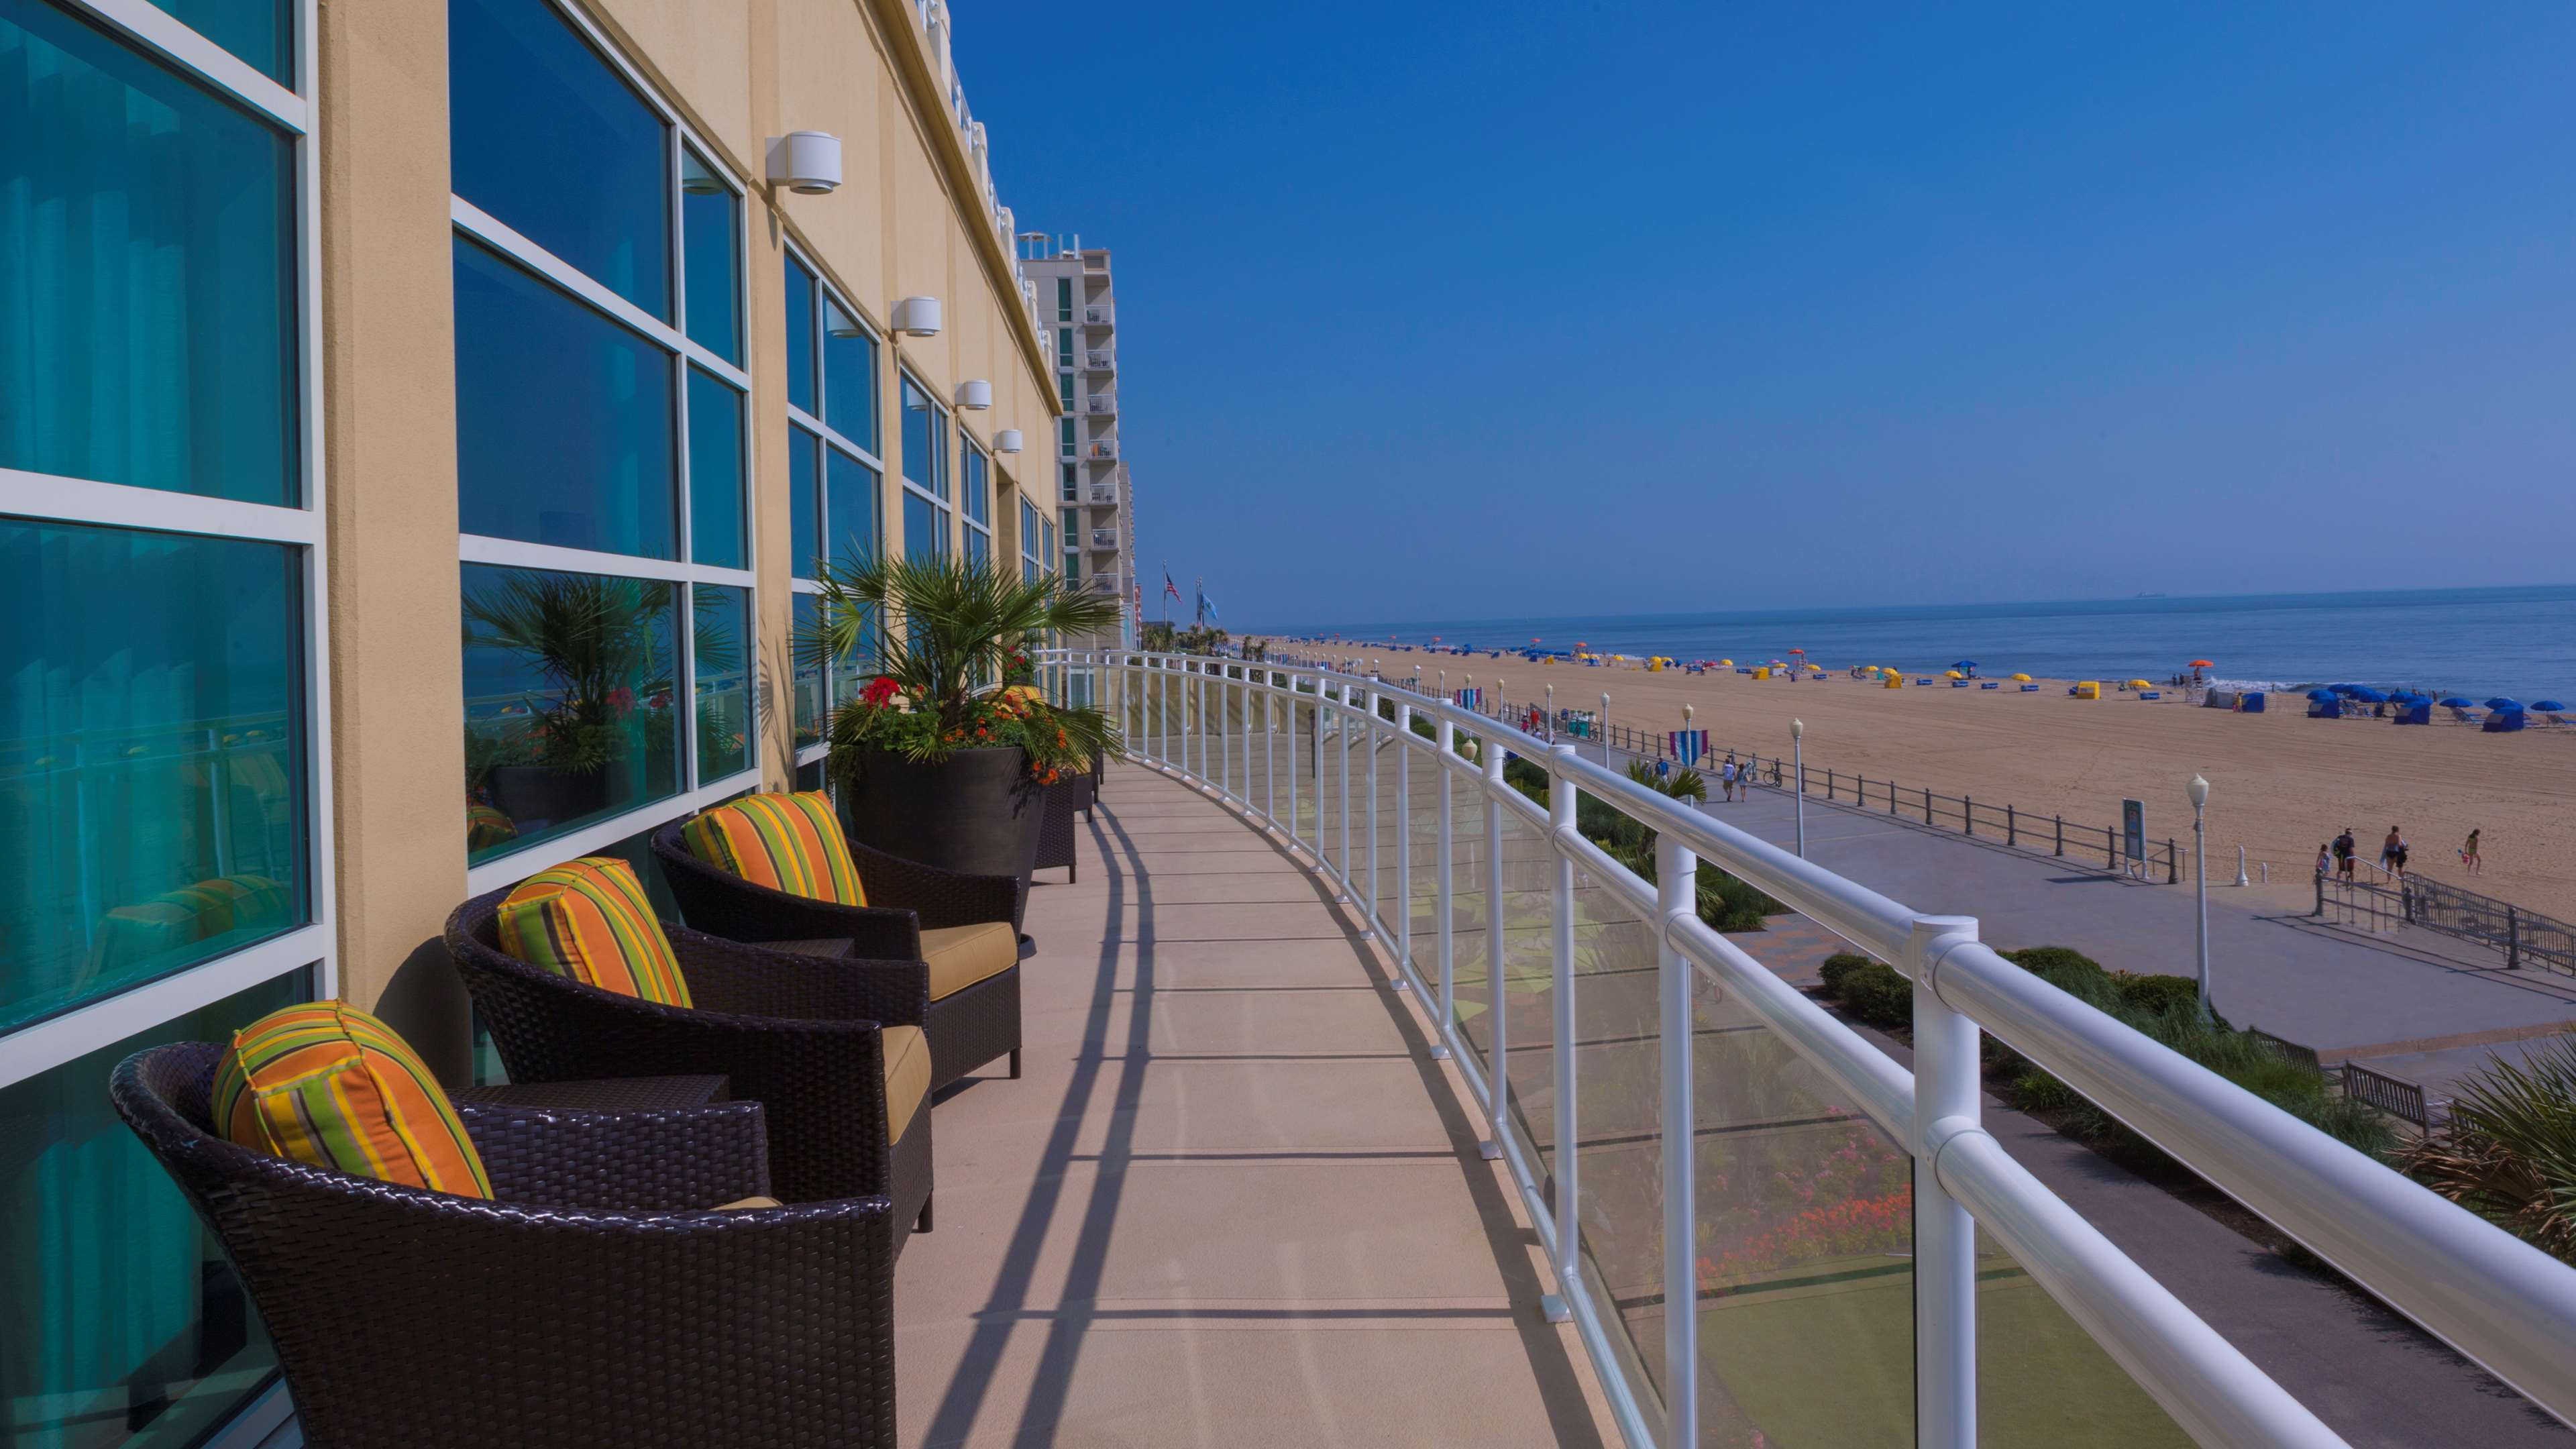 Hilton Garden Inn Virginia Beach Oceanfront image 50